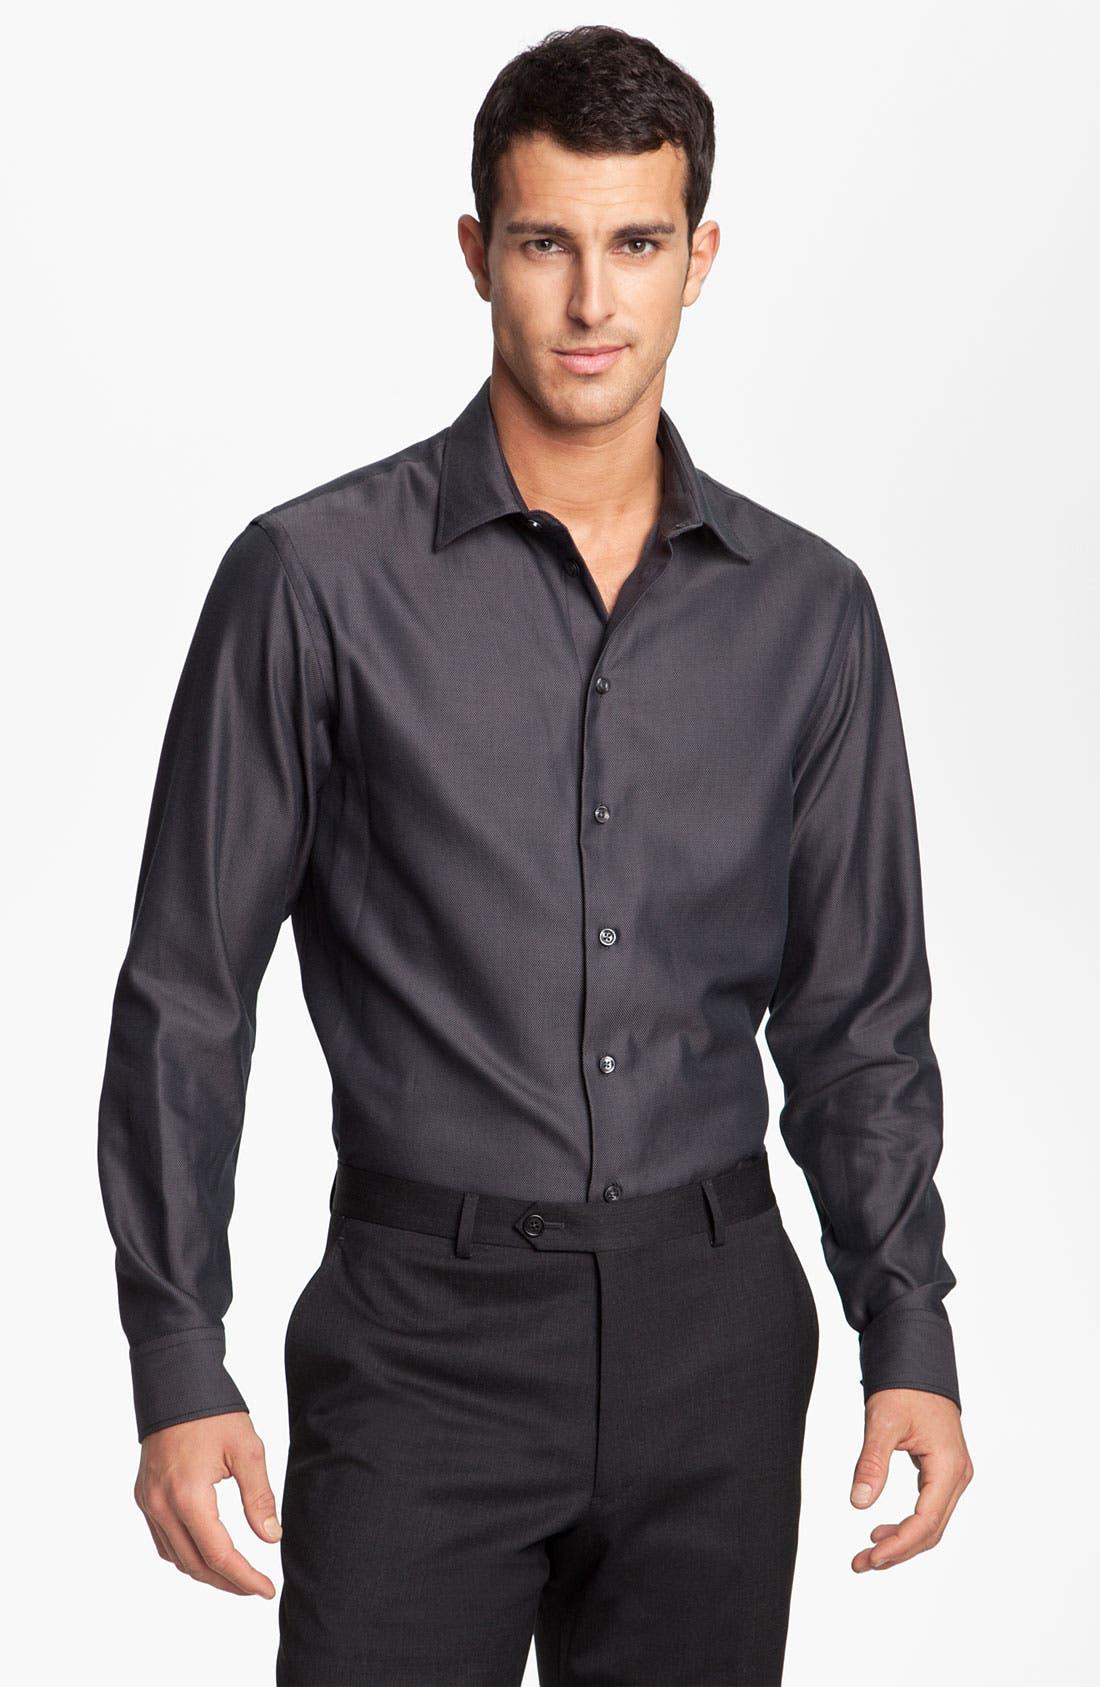 Alternate Image 1 Selected - Armani Collezioni Trim Fit Sport Shirt